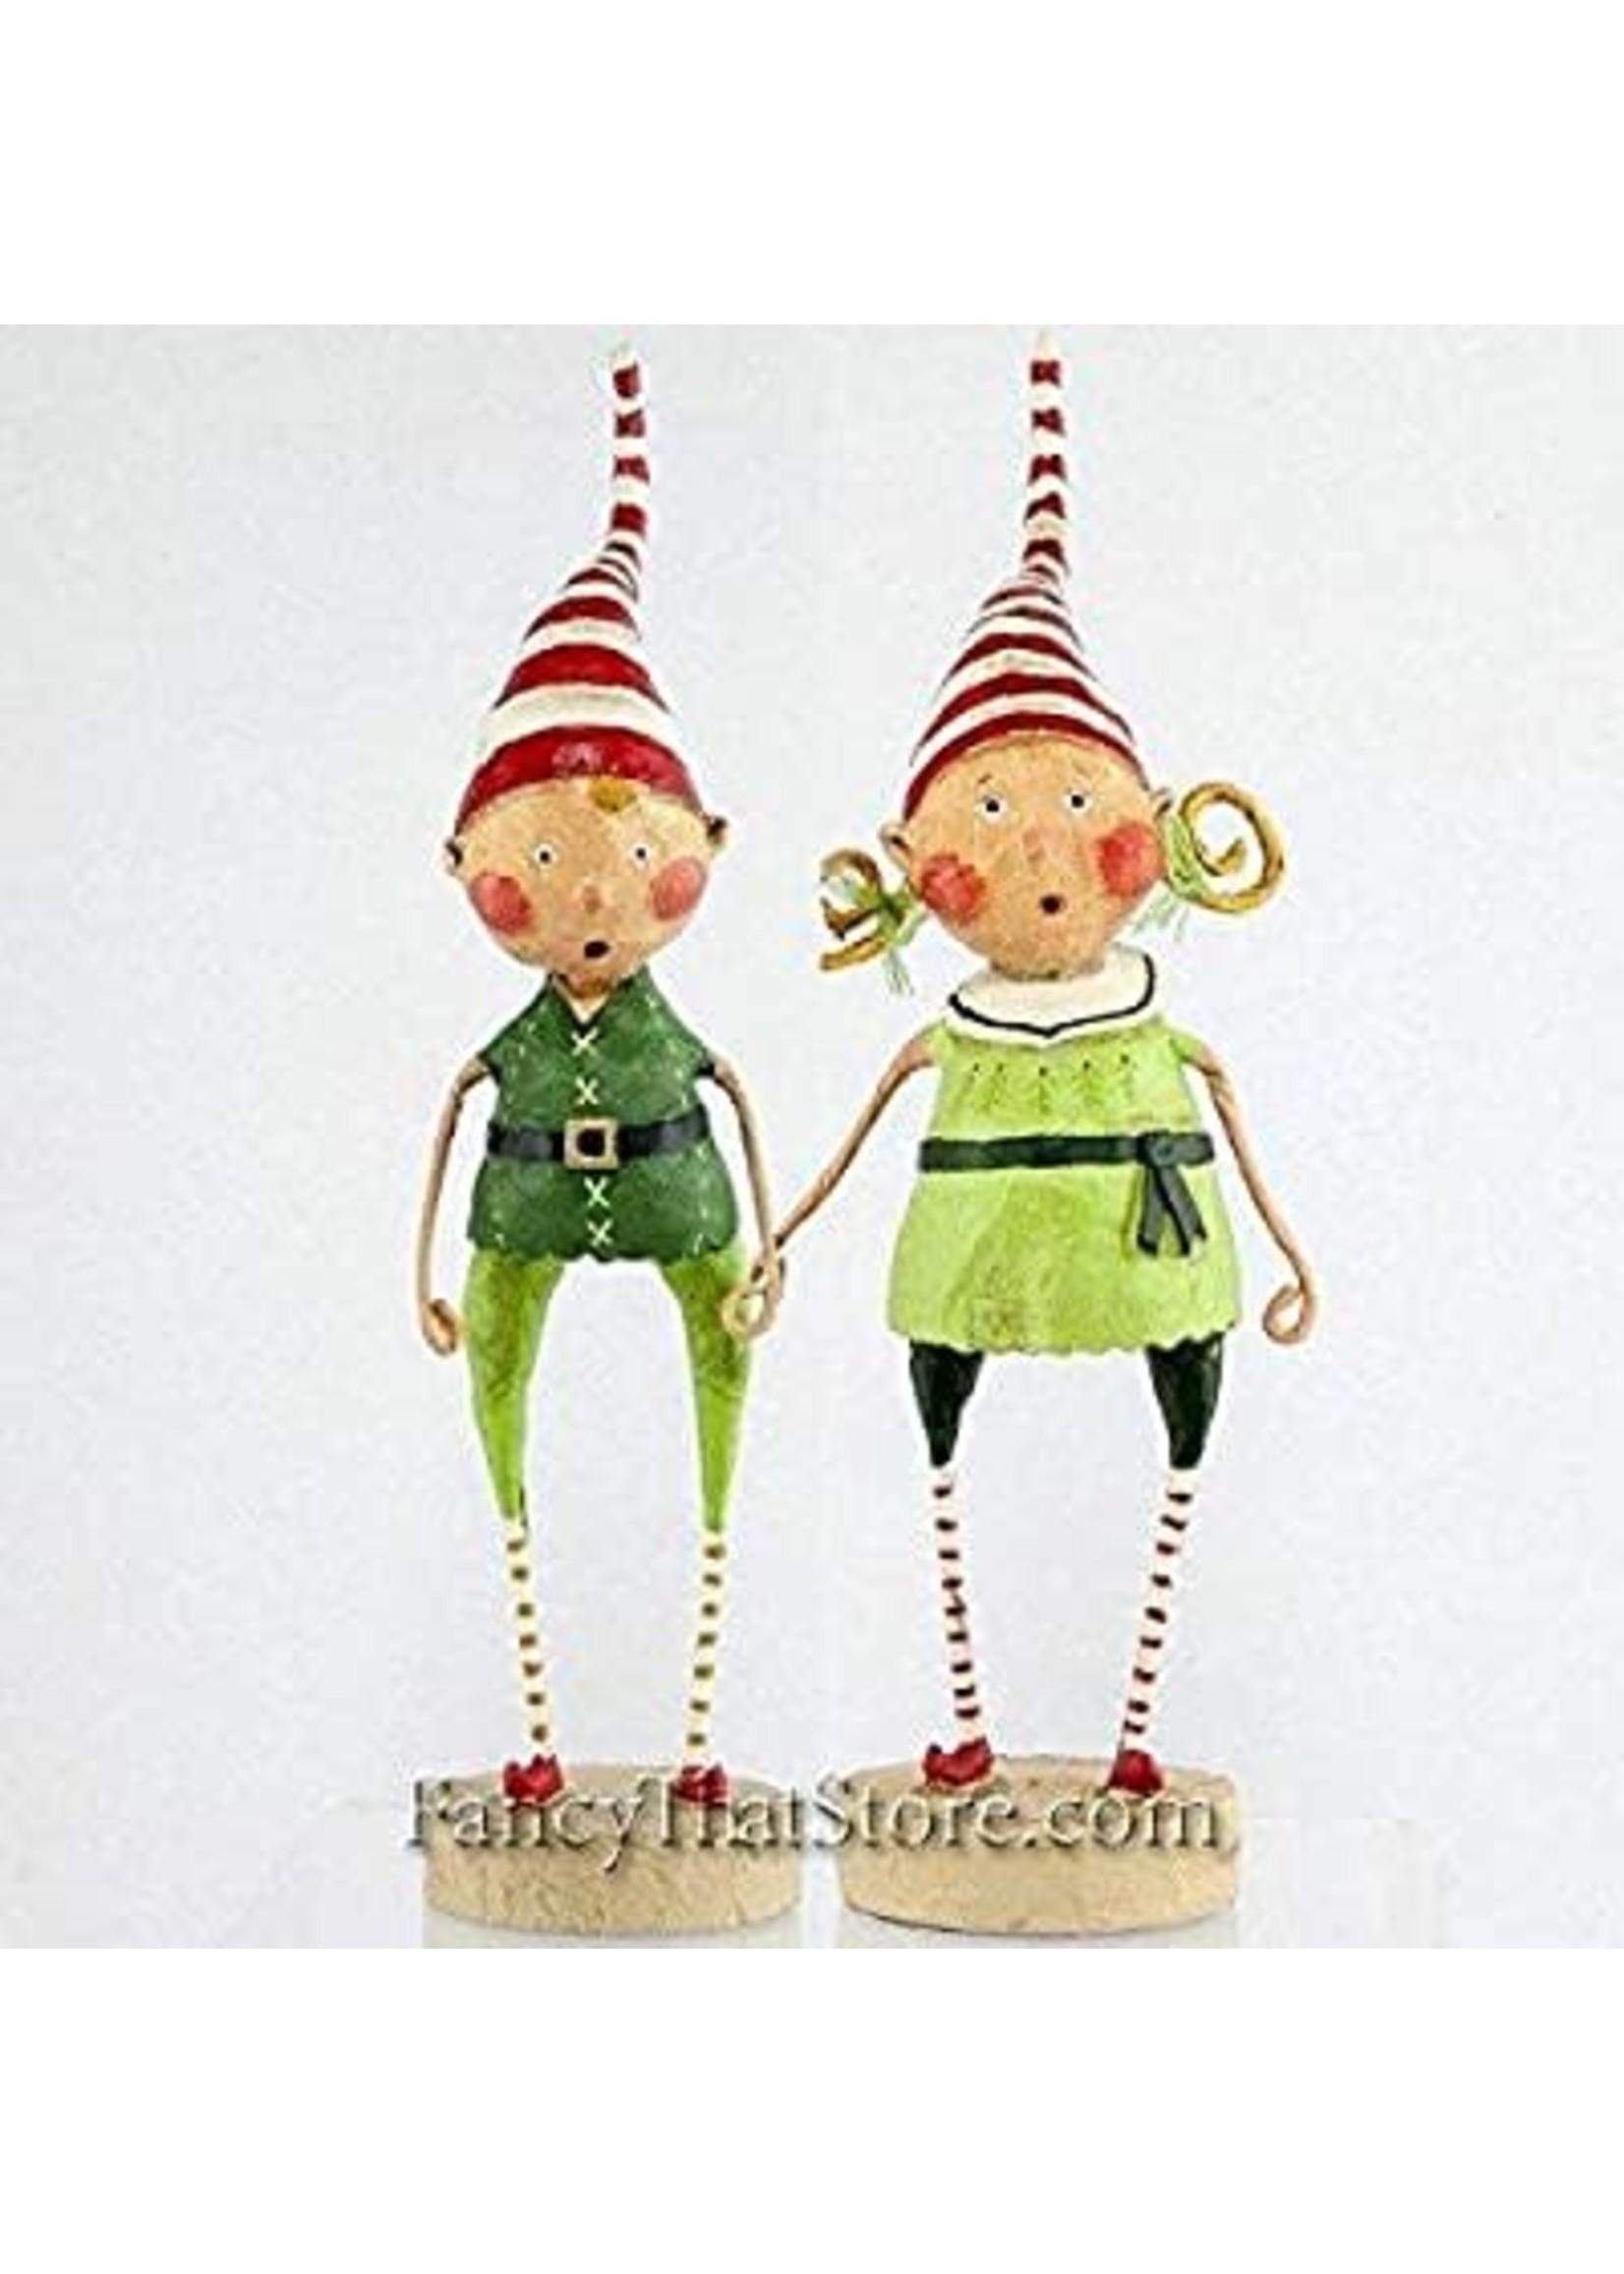 Lori Mitchell Tootsie and Tinker Twinkle, set of 2